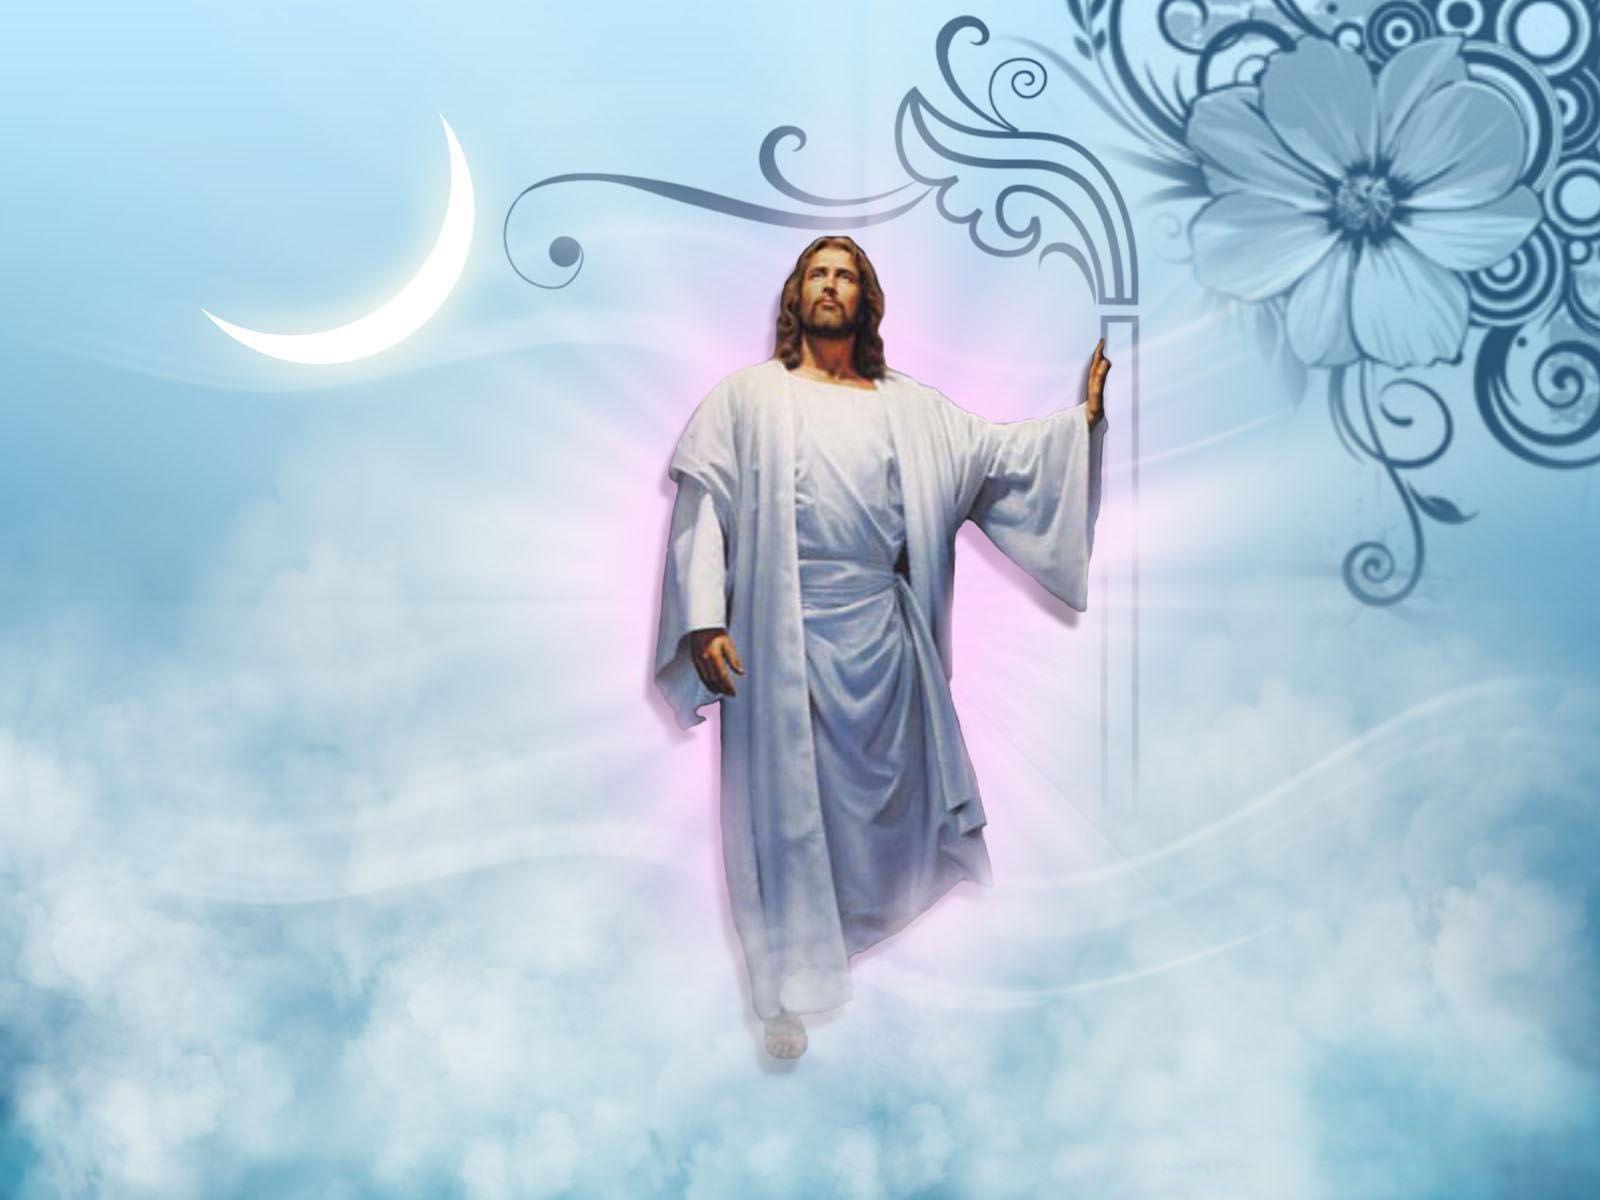 Jesus Wallpapers Download Jesus Wallpaper Cover Pics For Facebook Free Jesus Wallpaper Jesus photos full hd wallpaper download